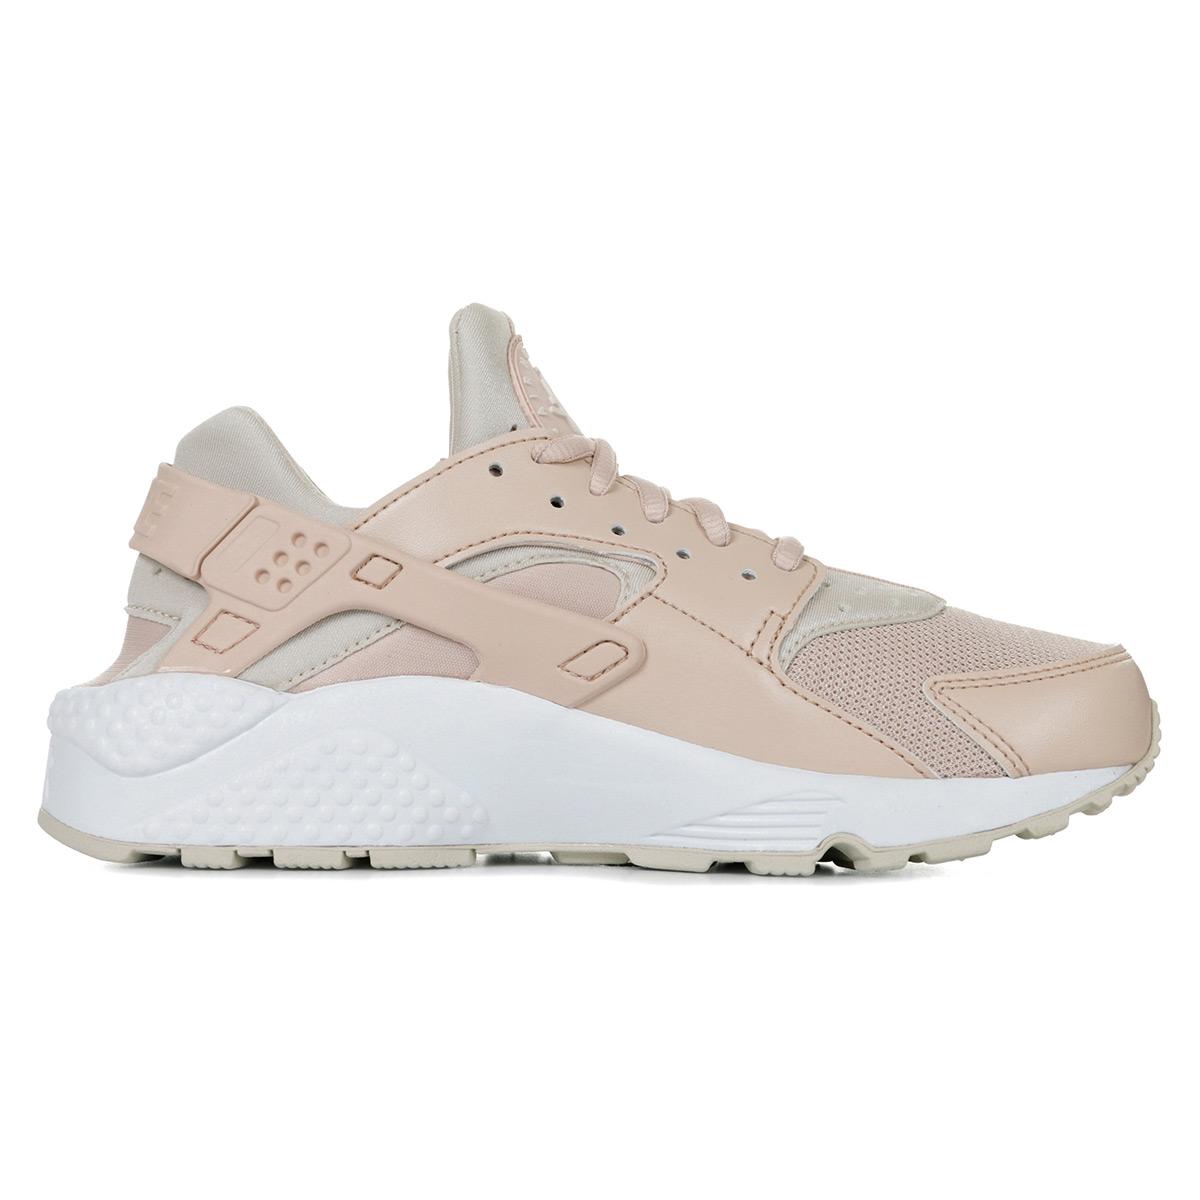 Chaussures-Baskets-Nike-femme-Wn-039-s-Air-Huarache-Run-034-Desert-Sand-034-taille-Beige miniature 4